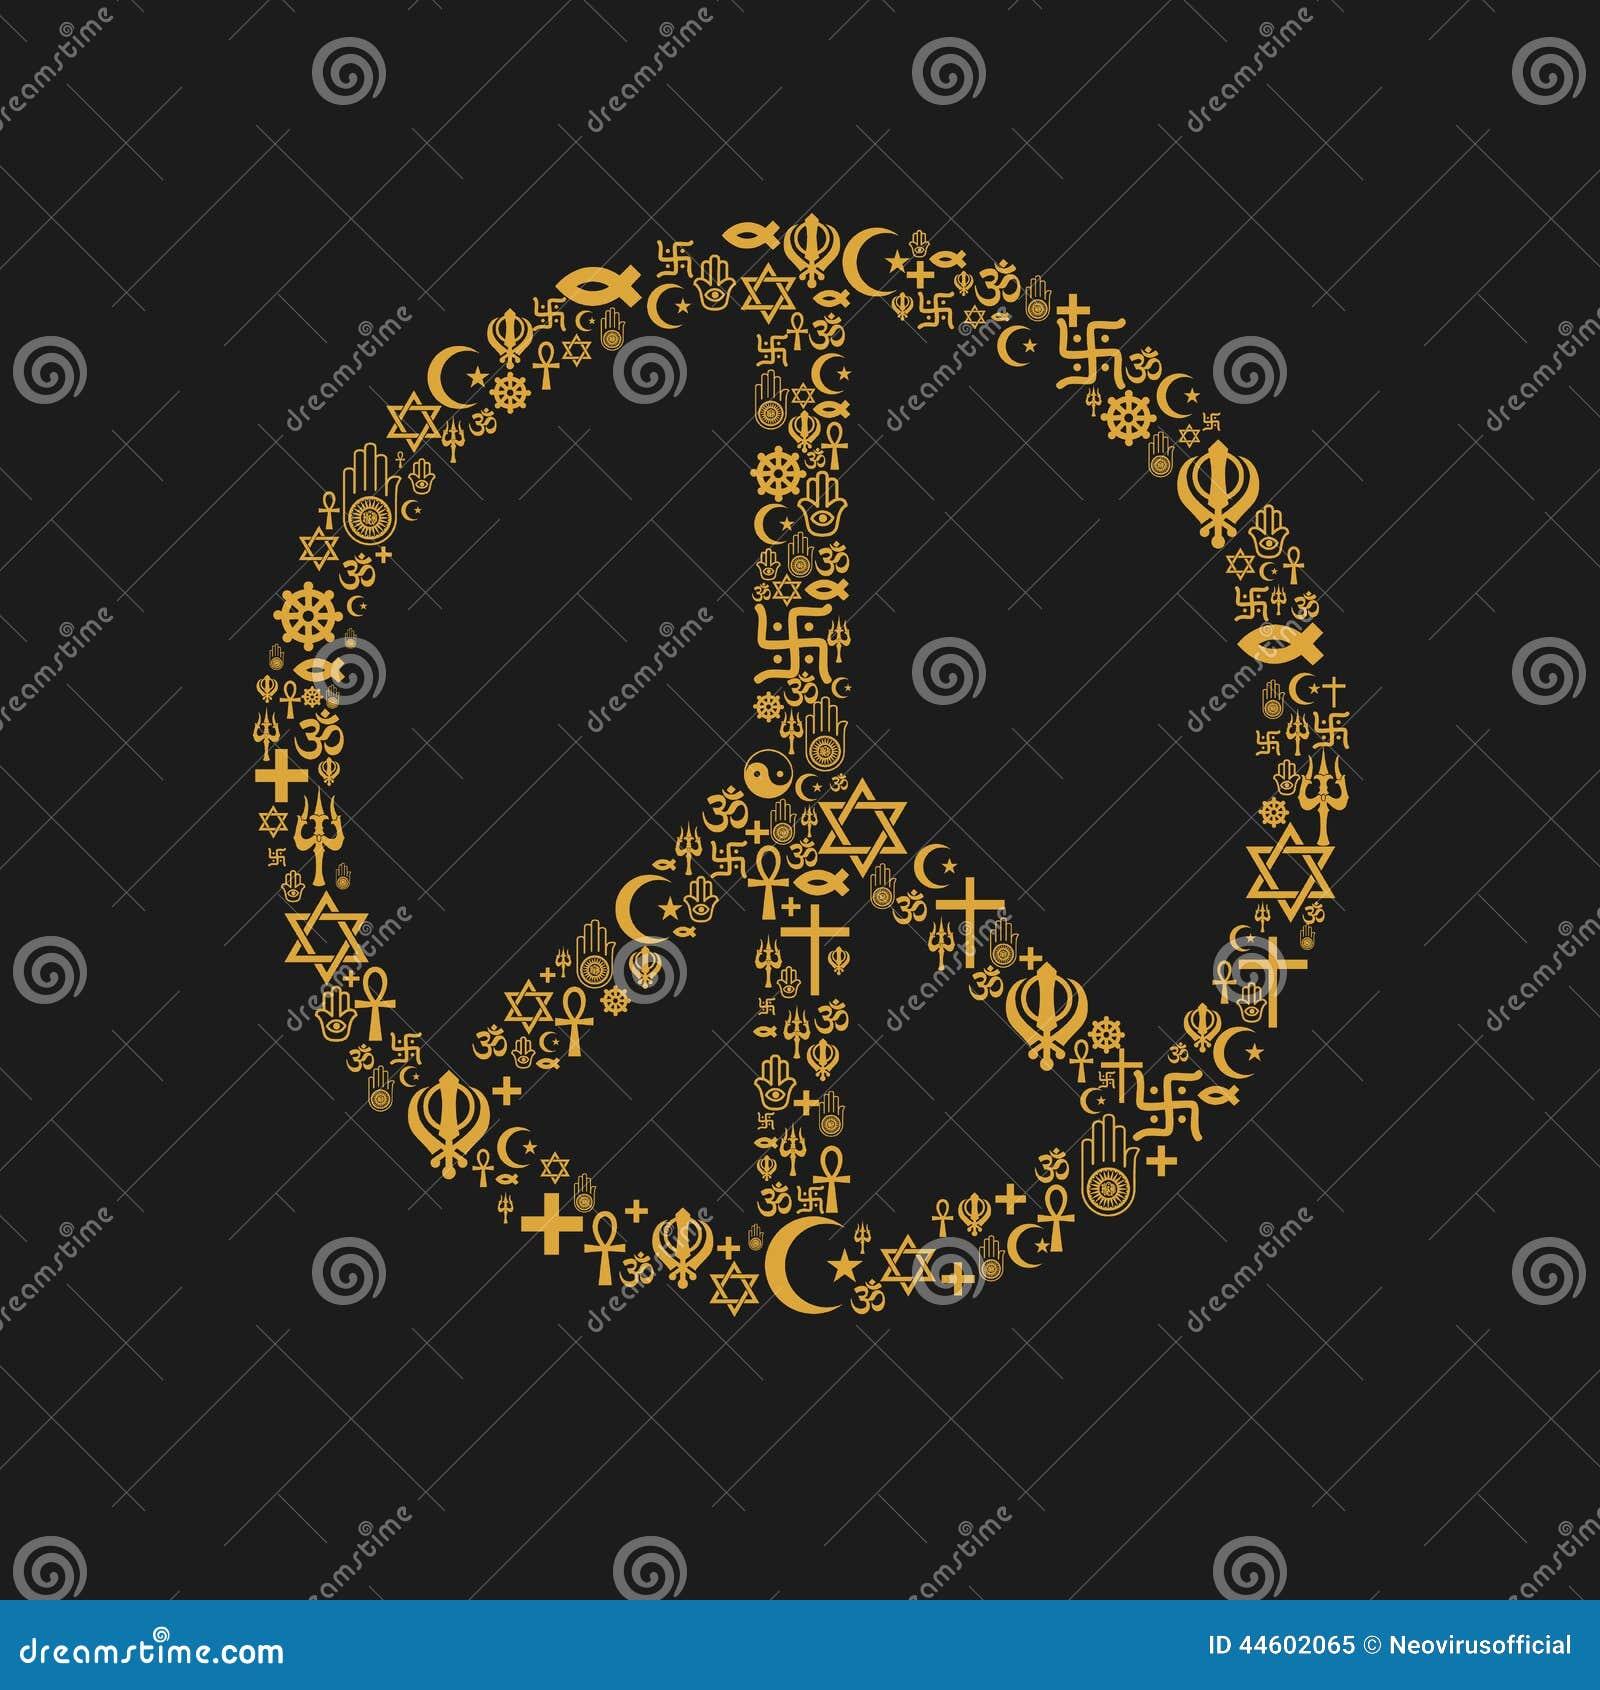 Religions Peace Flower Heart Symbol Stock Vector Illustration Of